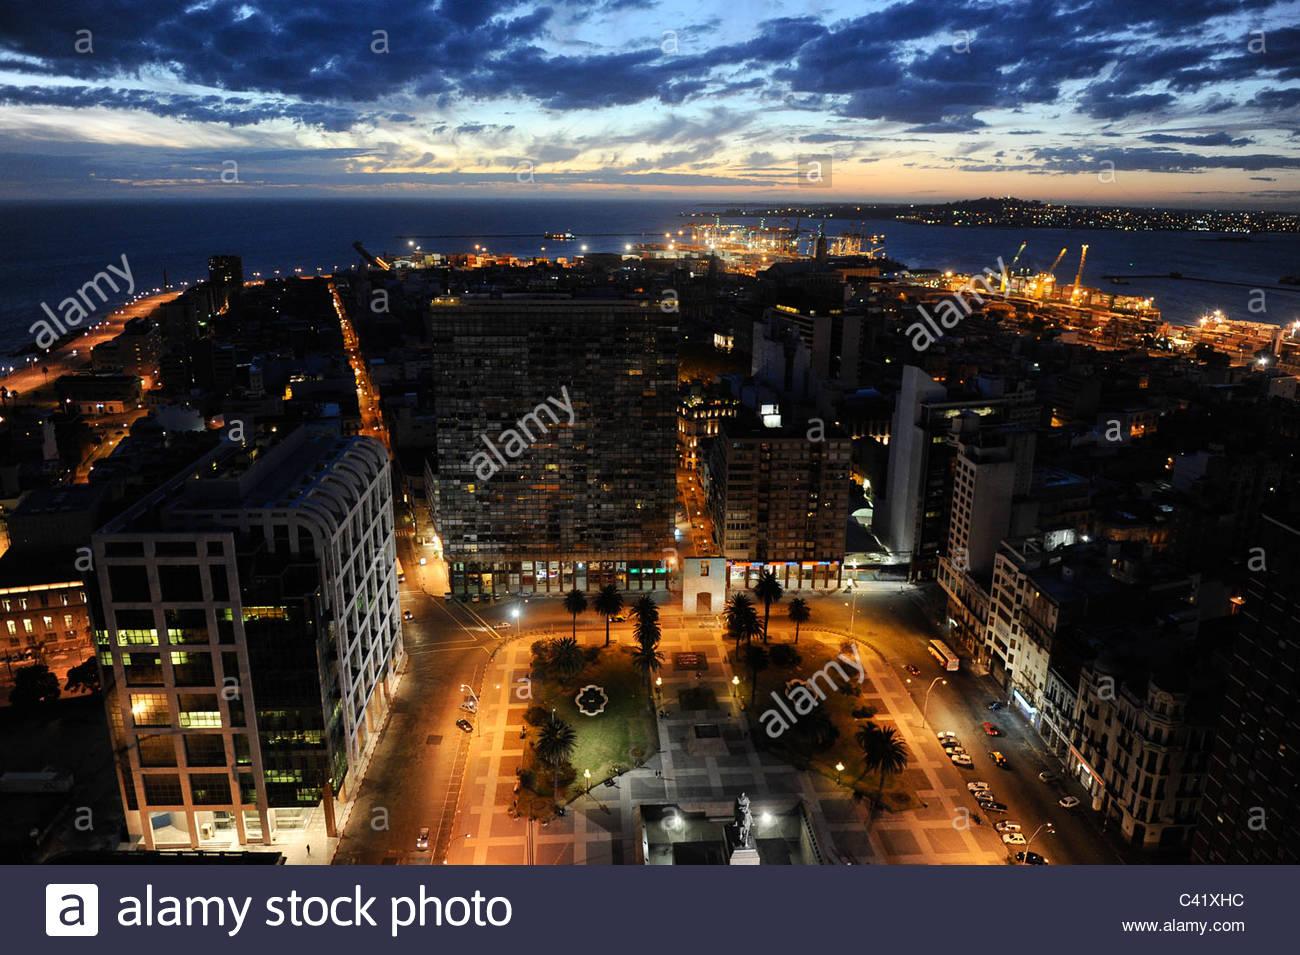 URUGUAY Montevideo view from Palacio Salvo at Plaza de Independencia to the harbour at Rio del la Plata - Stock Image